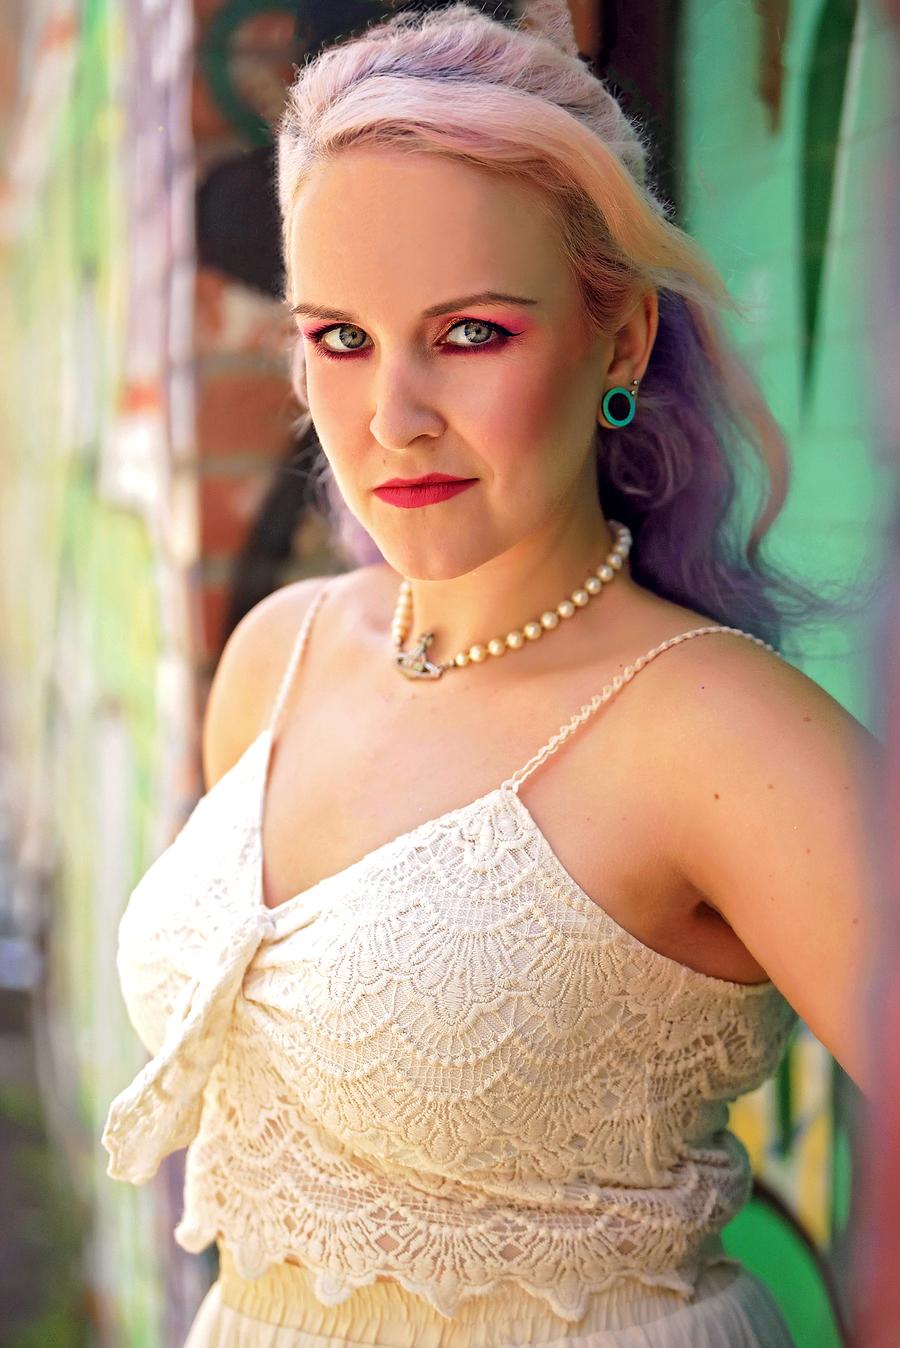 L.A / Model Leanne / Uploaded 17th December 2019 @ 11:42 PM